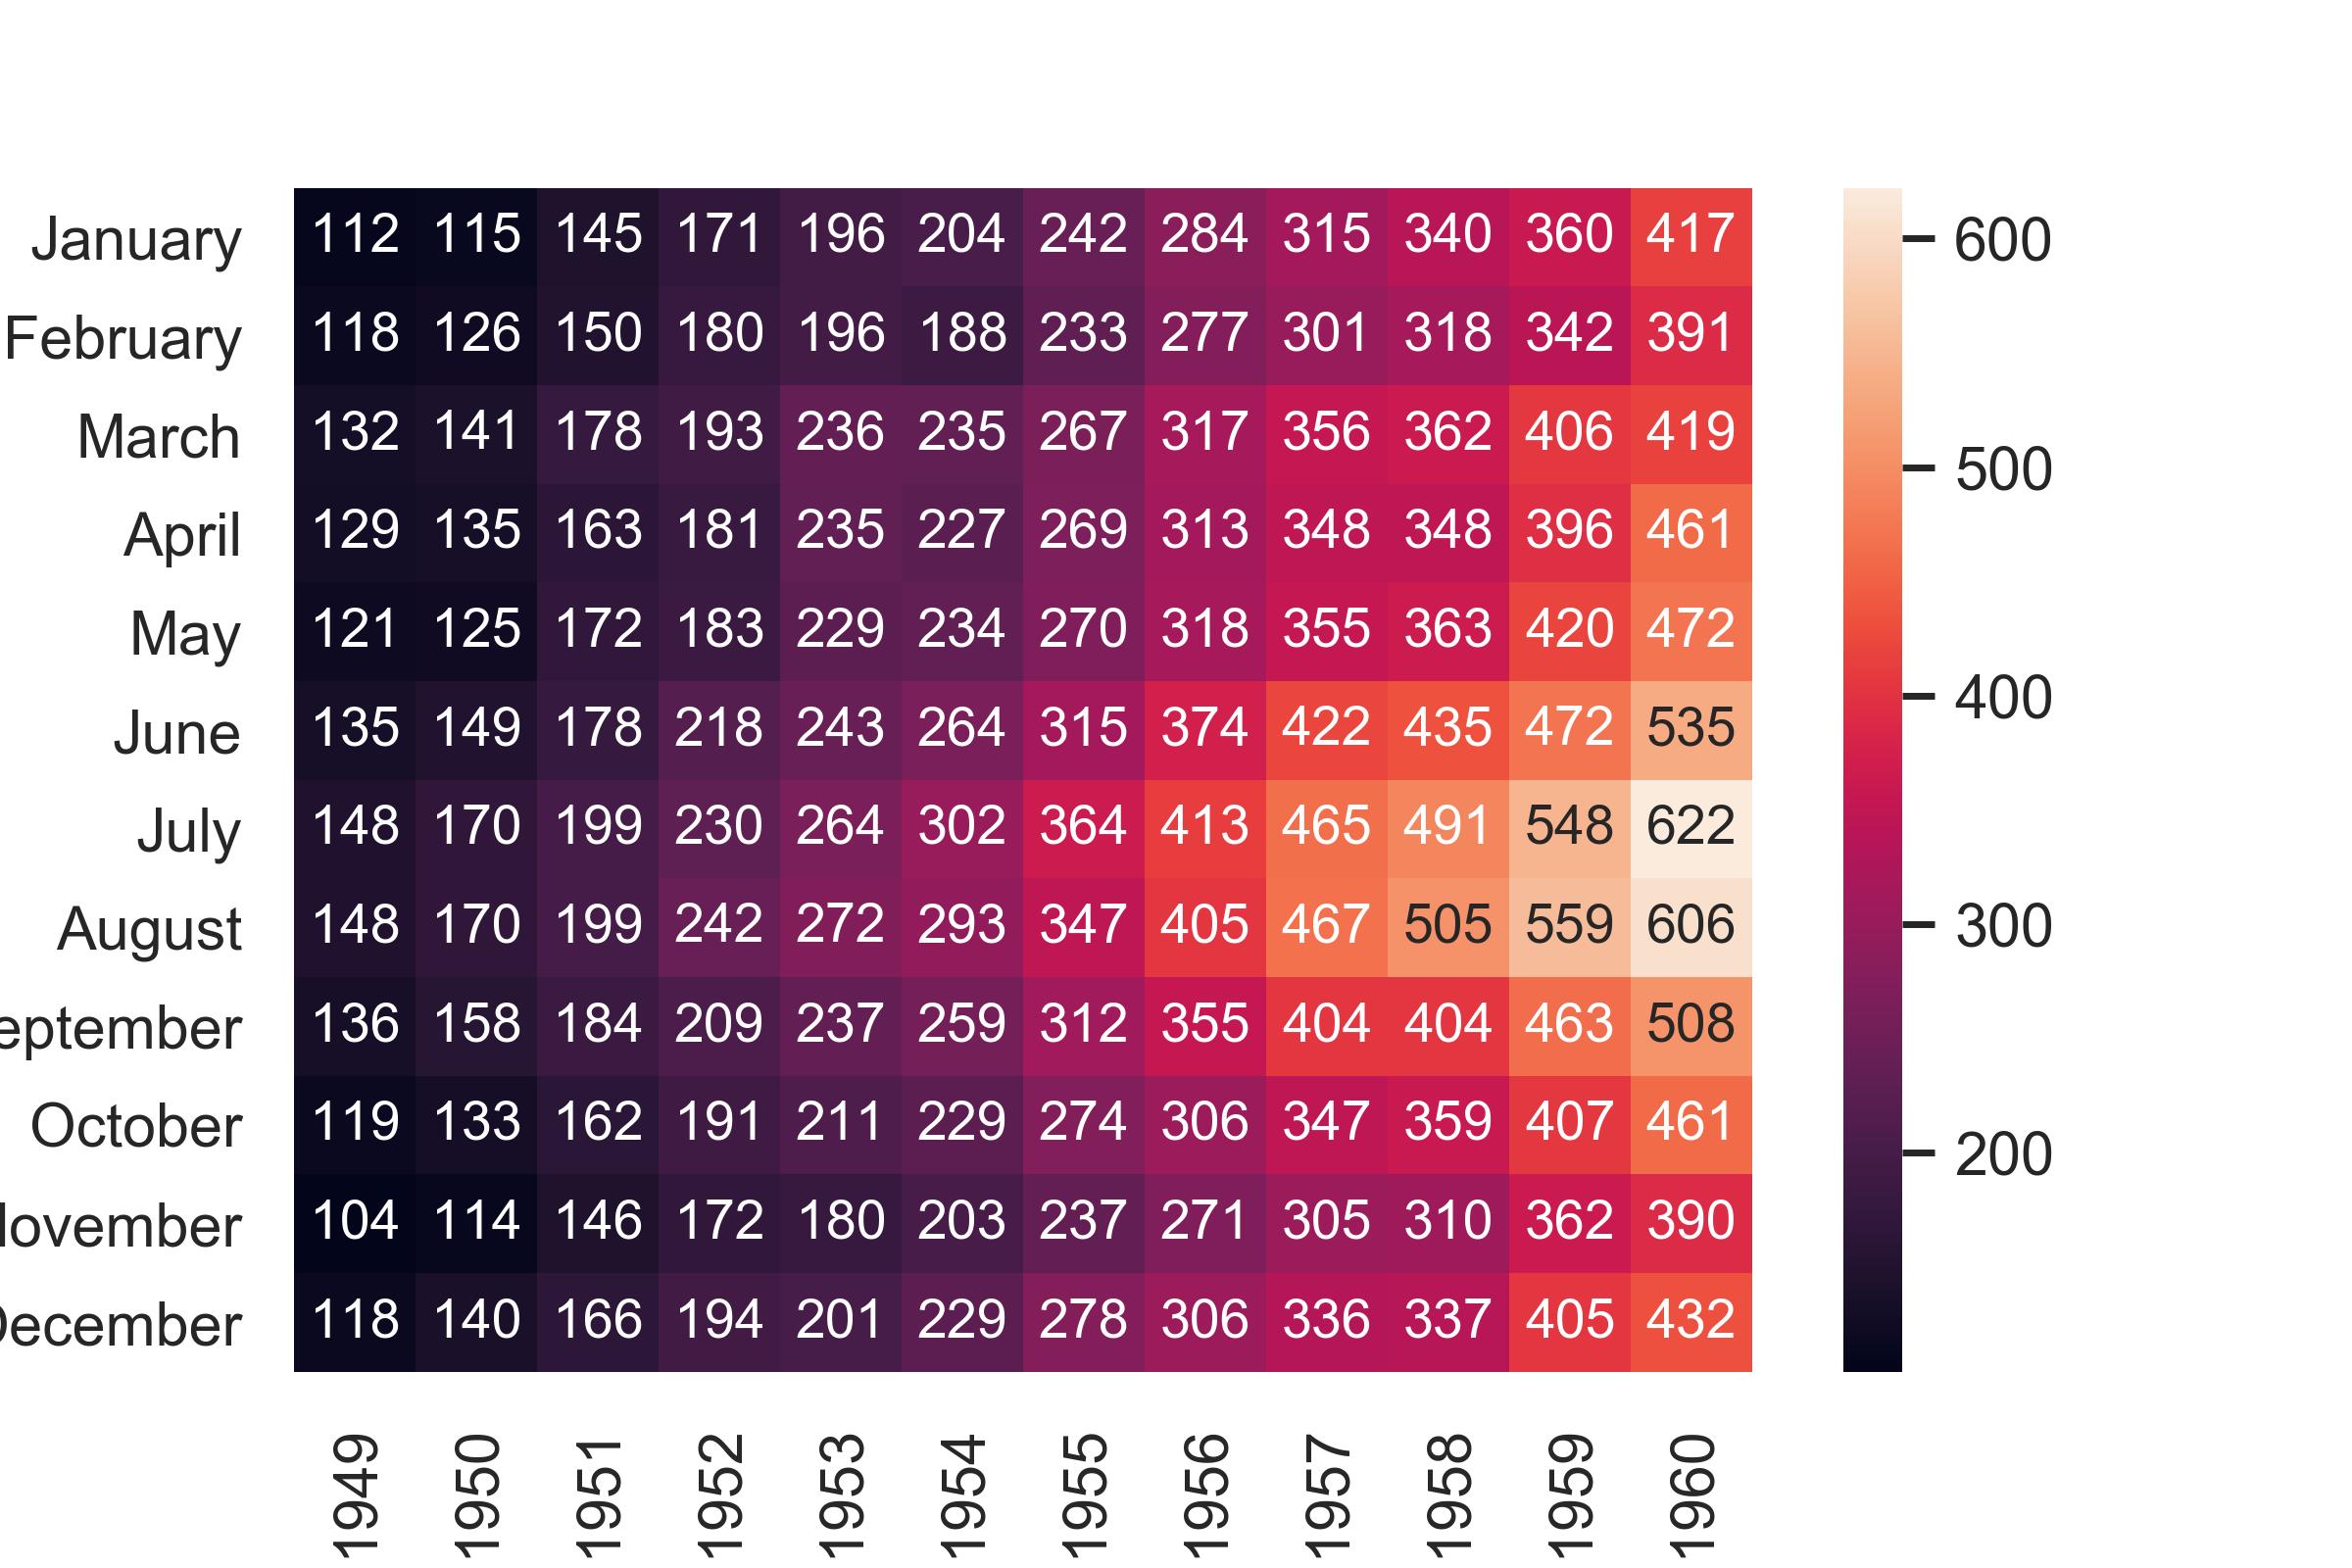 heatmap2.png